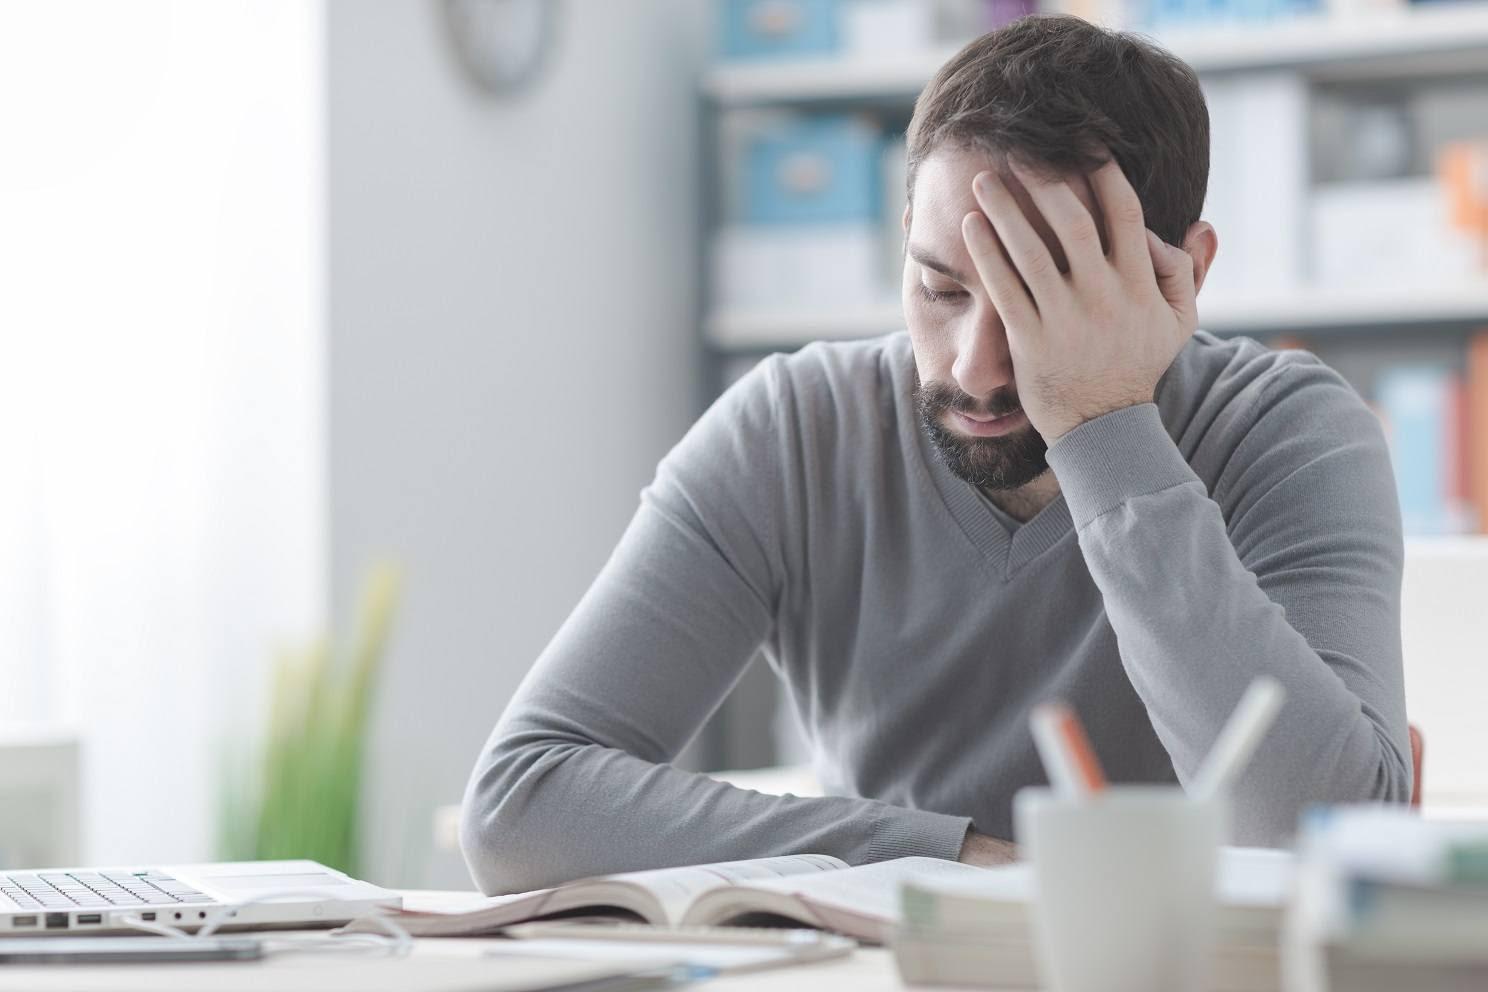 Zona de conforto pode prejudicar diversos aspectos da vida